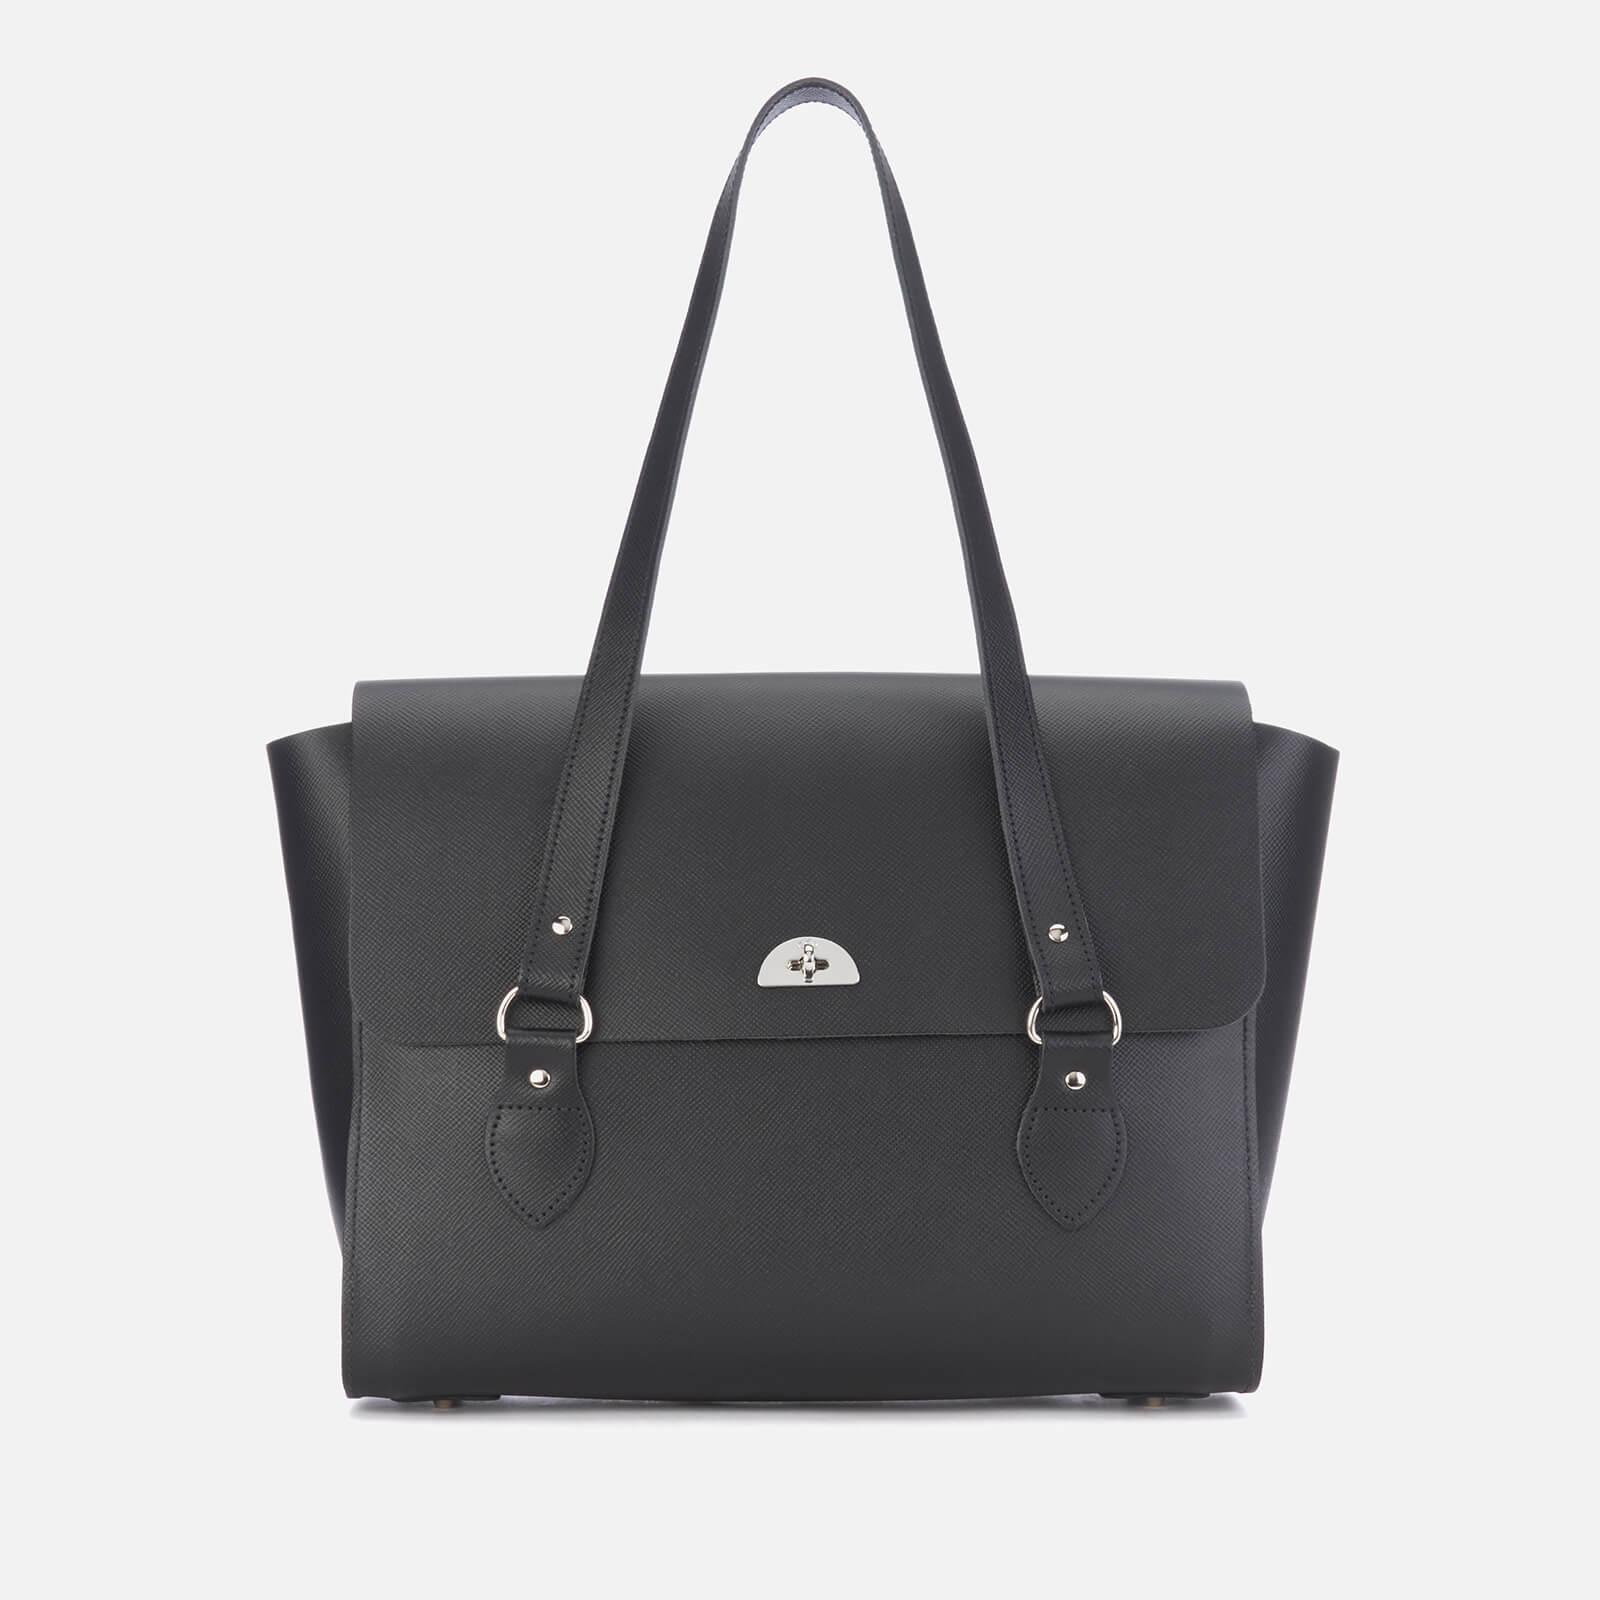 The Cambridge Satchel Company Women's Large Emily Tote Bag - Black